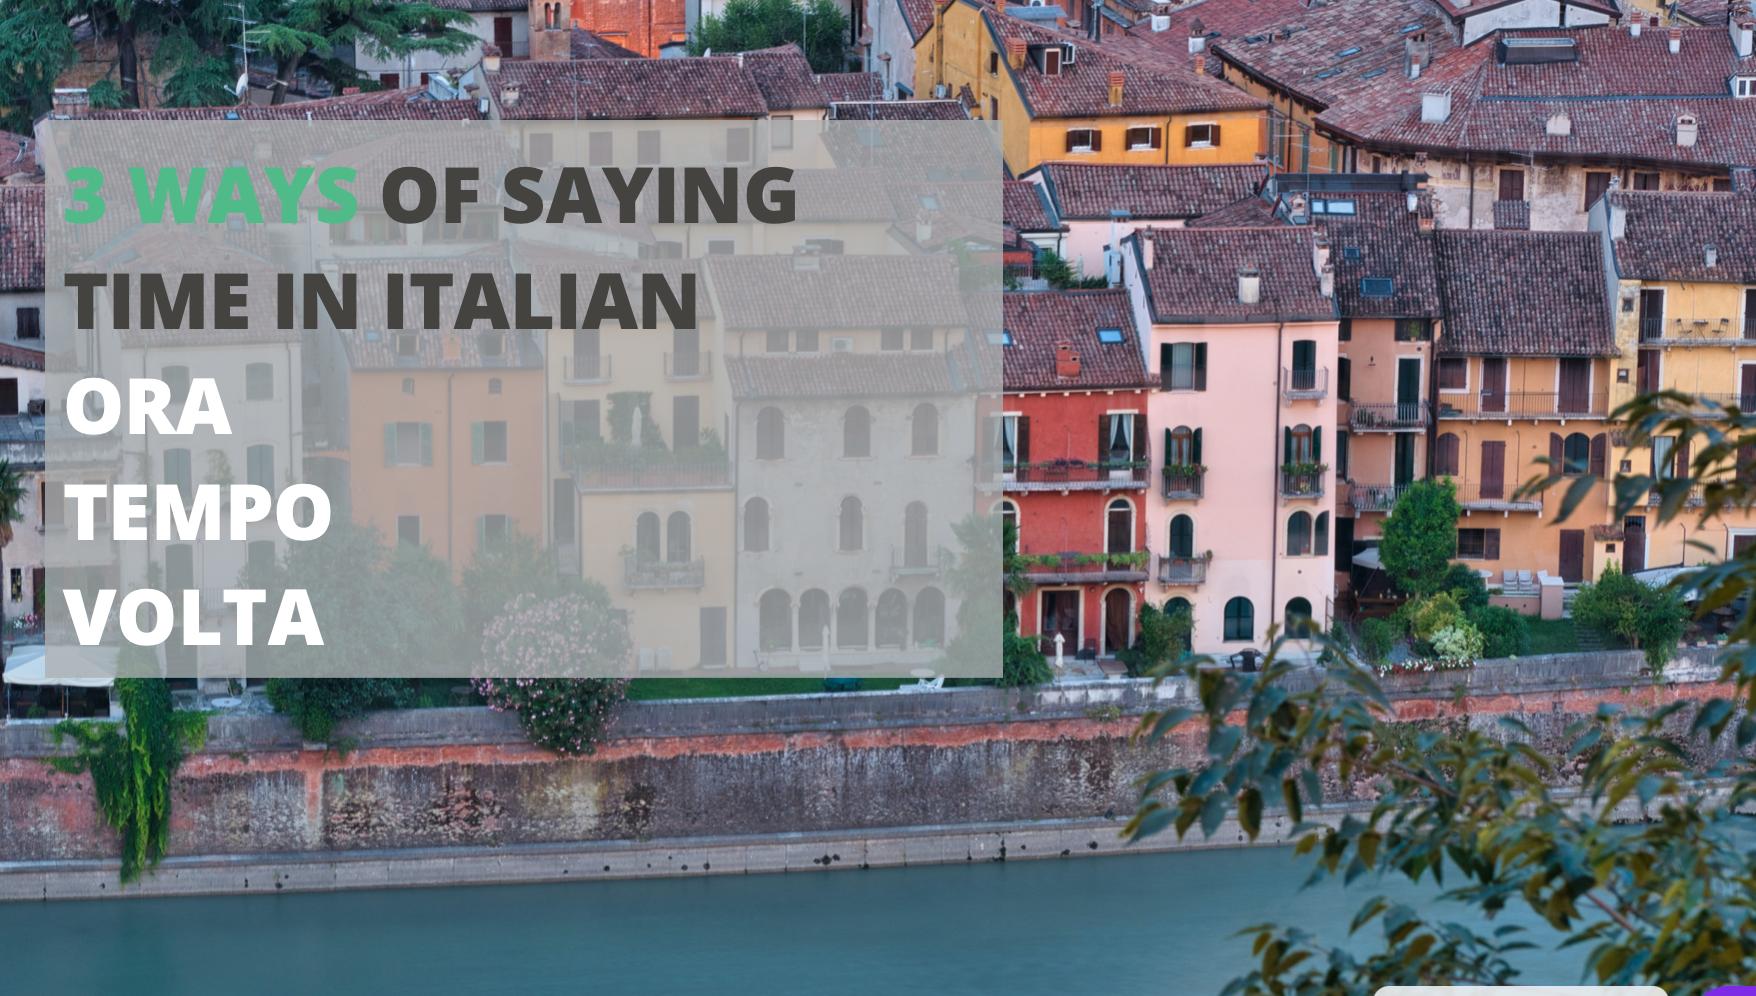 The 3 ways of saying TIME in Italian – ORA/TEMPO/VOLTA